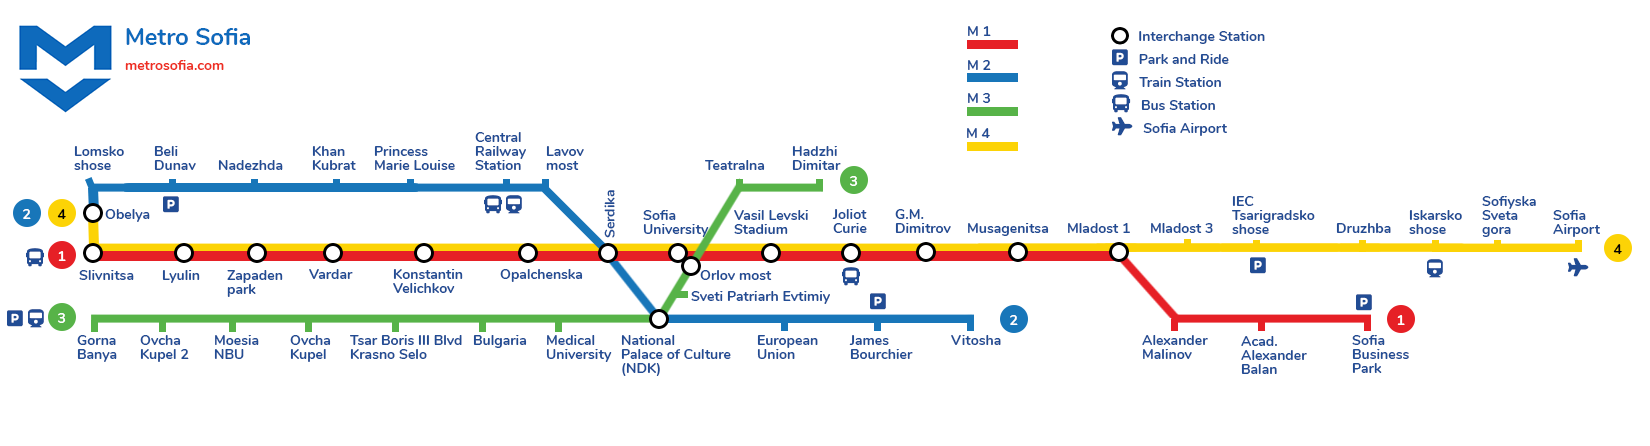 Current La Subway Map.Sofia Metro Map